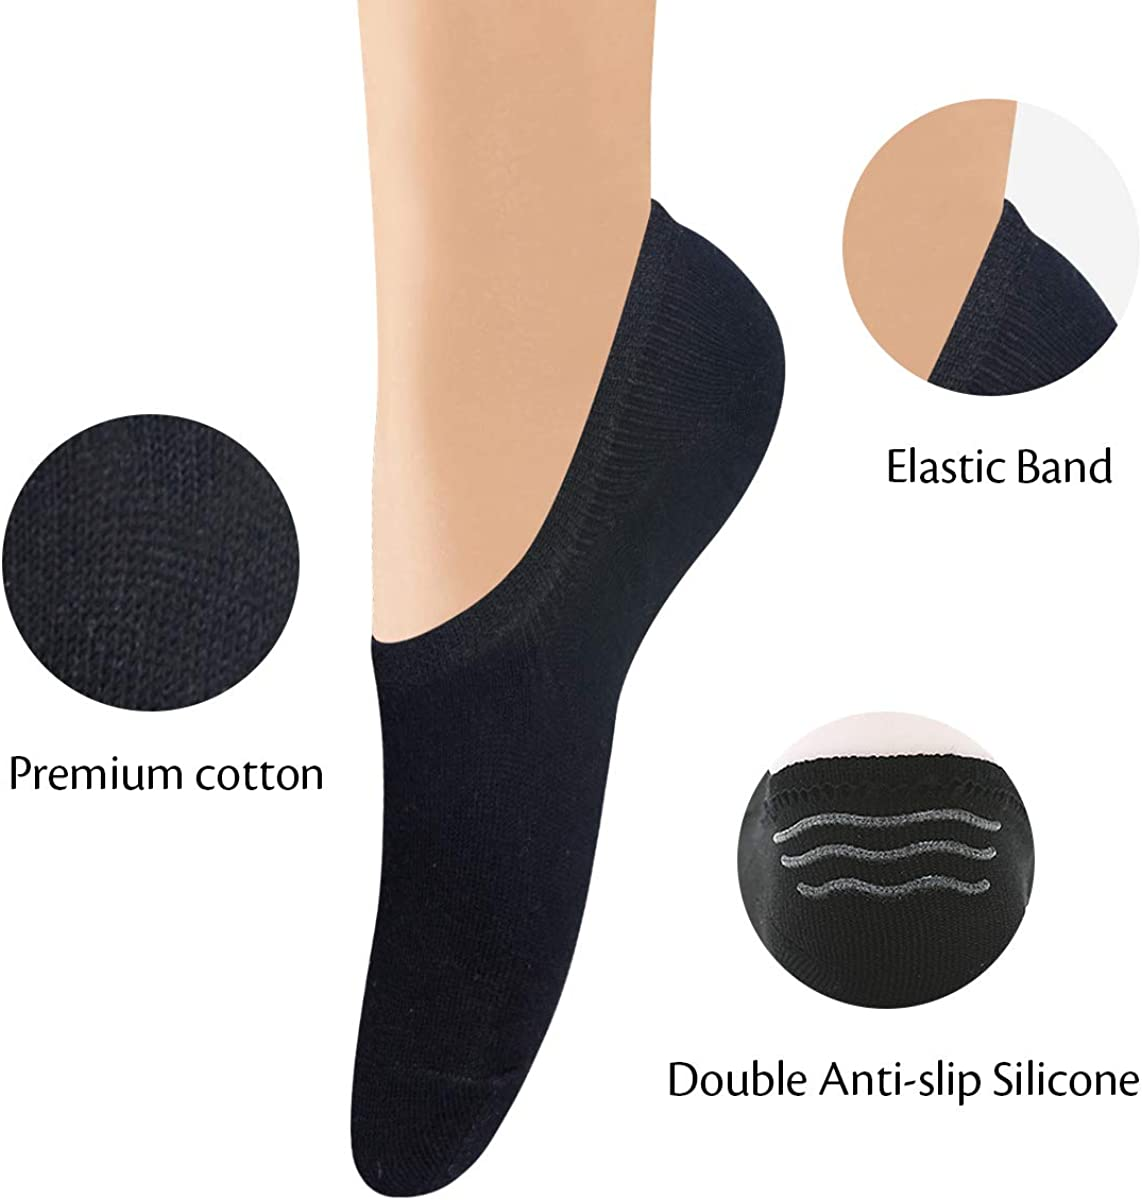 Blesiya 5 Pairs Fashion Men Multi Pattern Trainer Cotton Sweat Ankle Socks